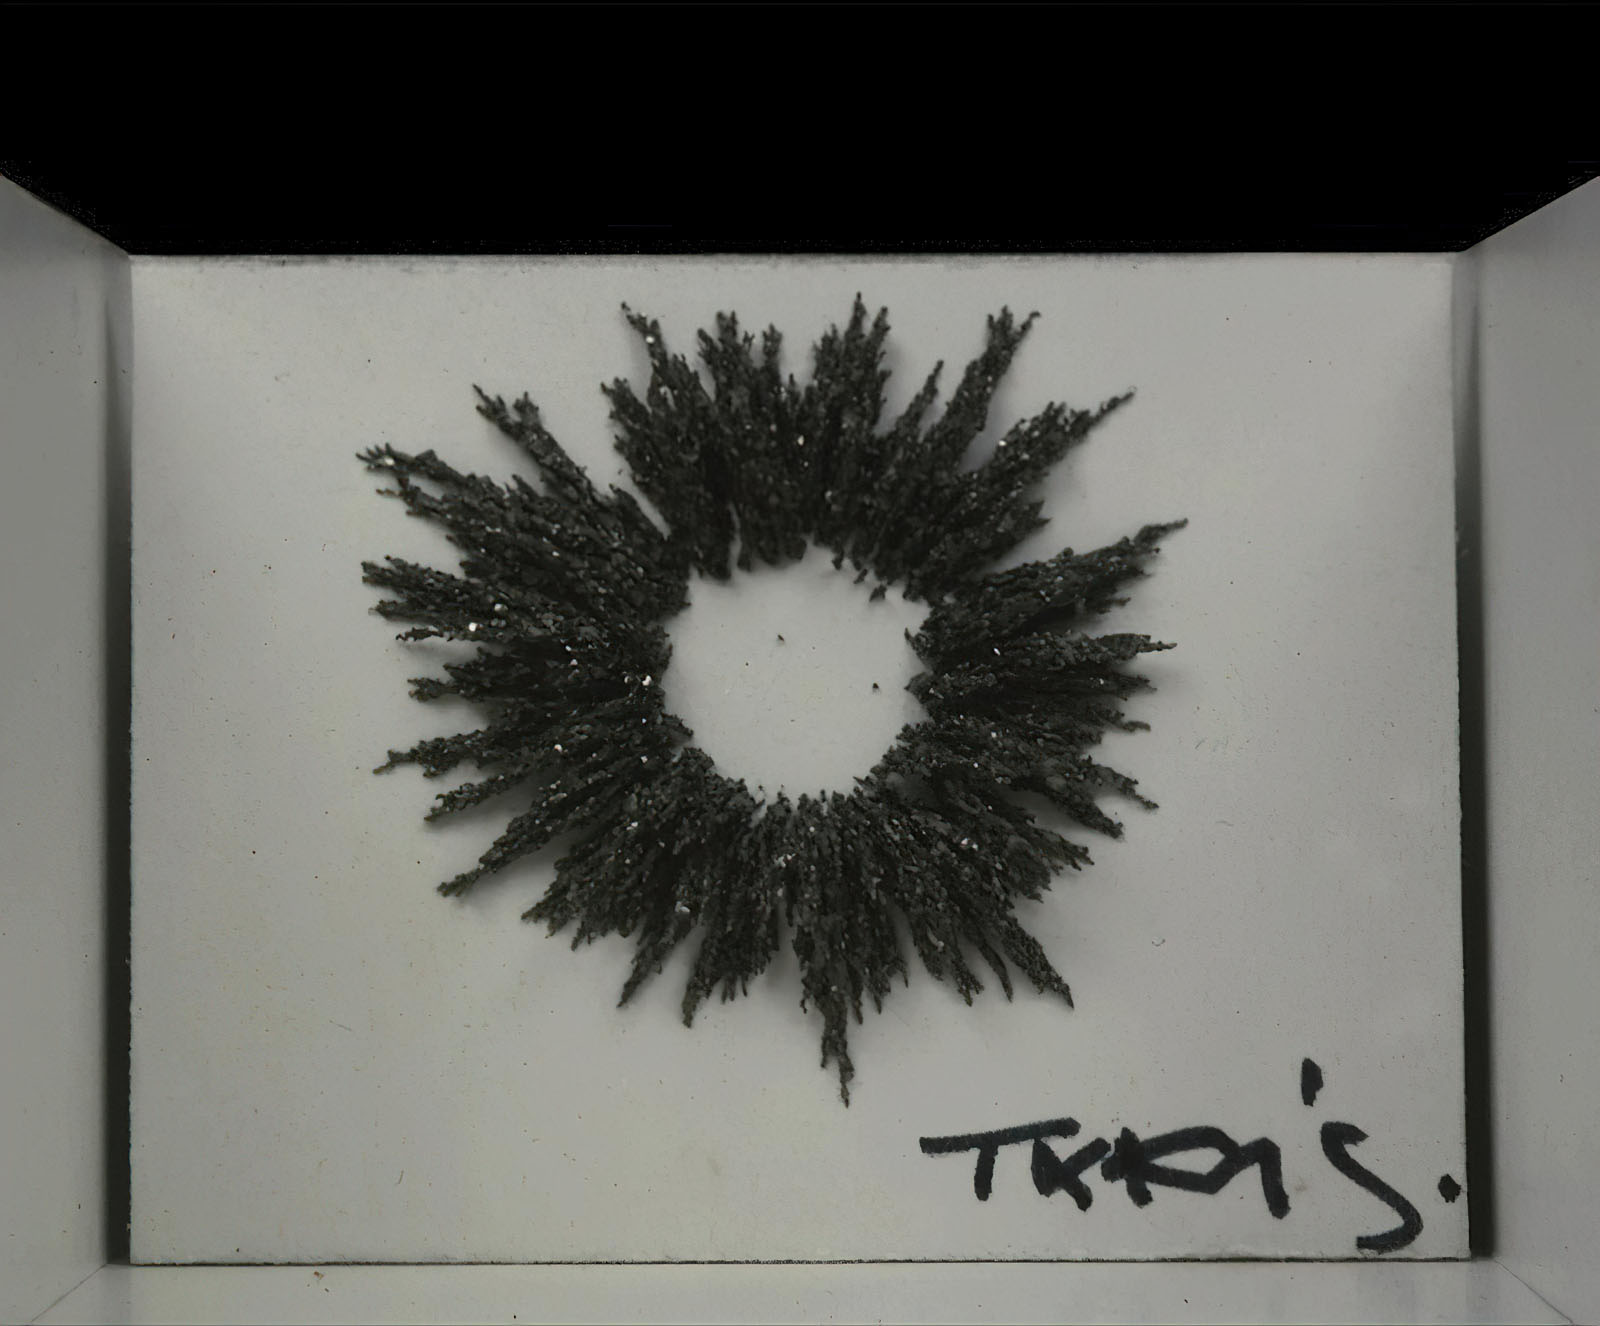 Takis (Vassilakis) - Magnetic Fallout